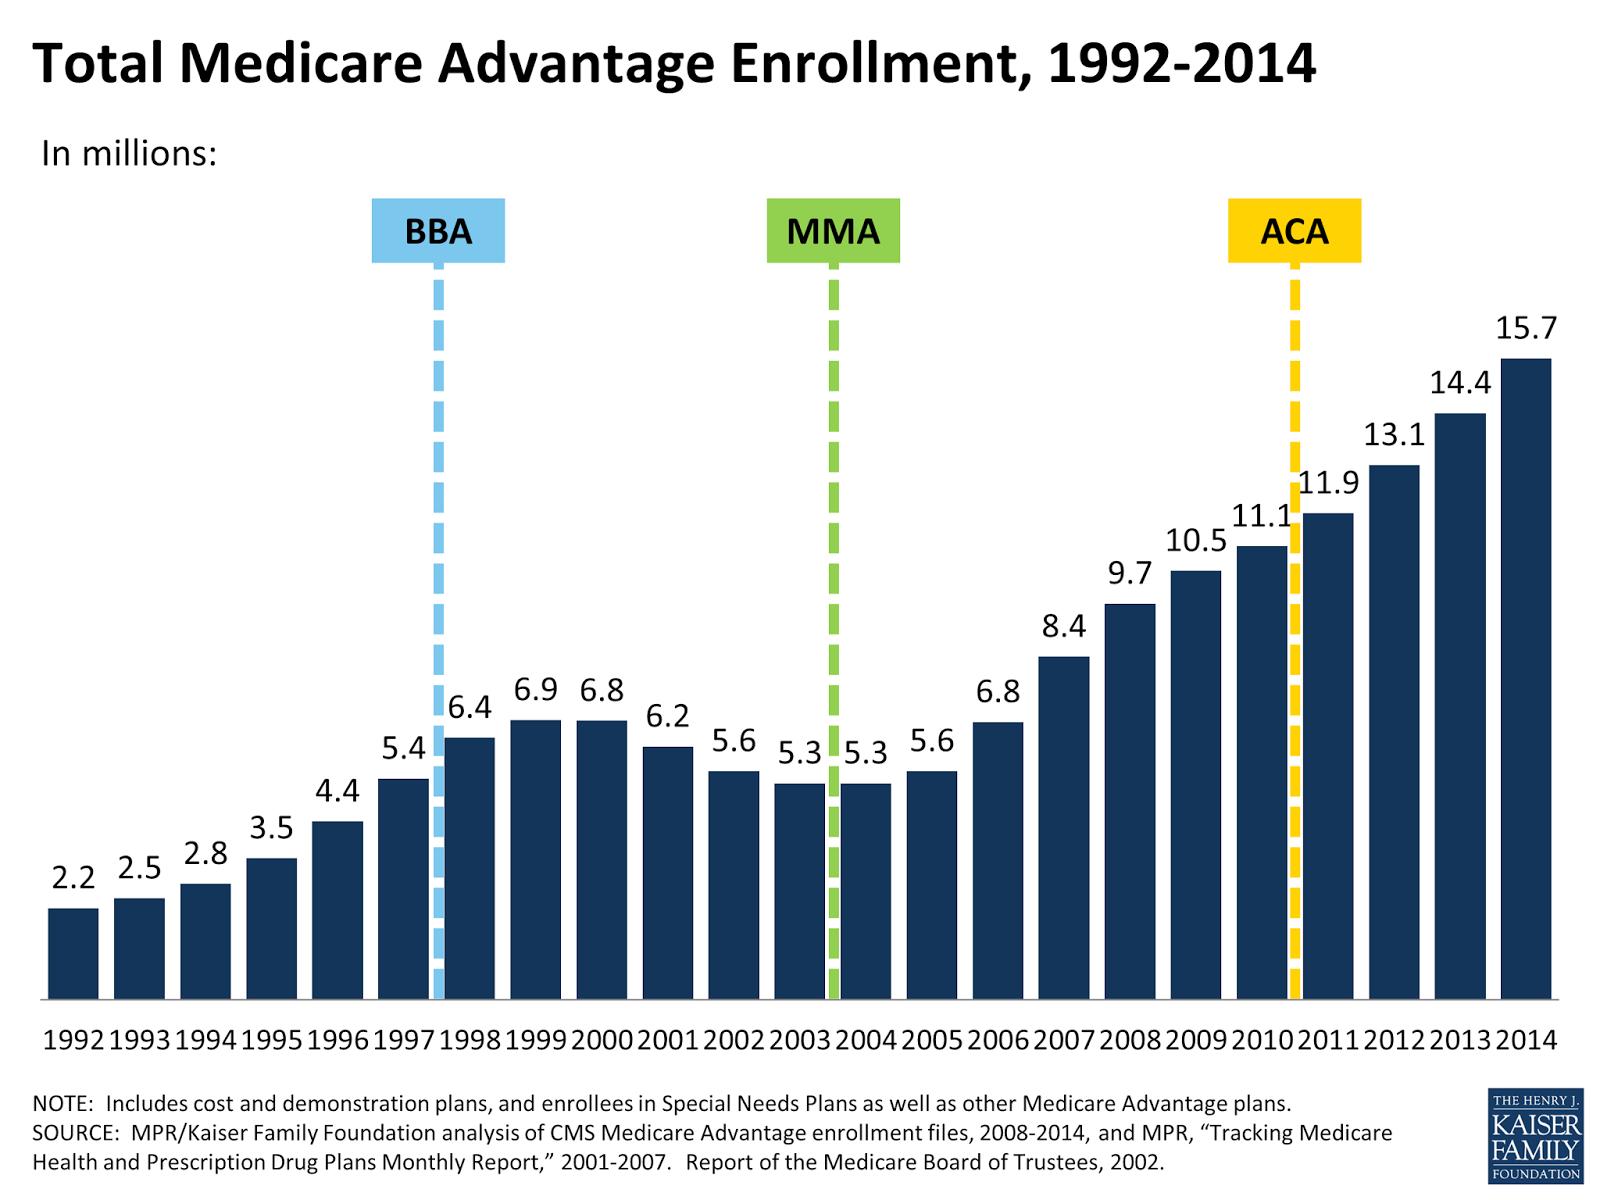 Growth in Medicare Advantage Enrollment